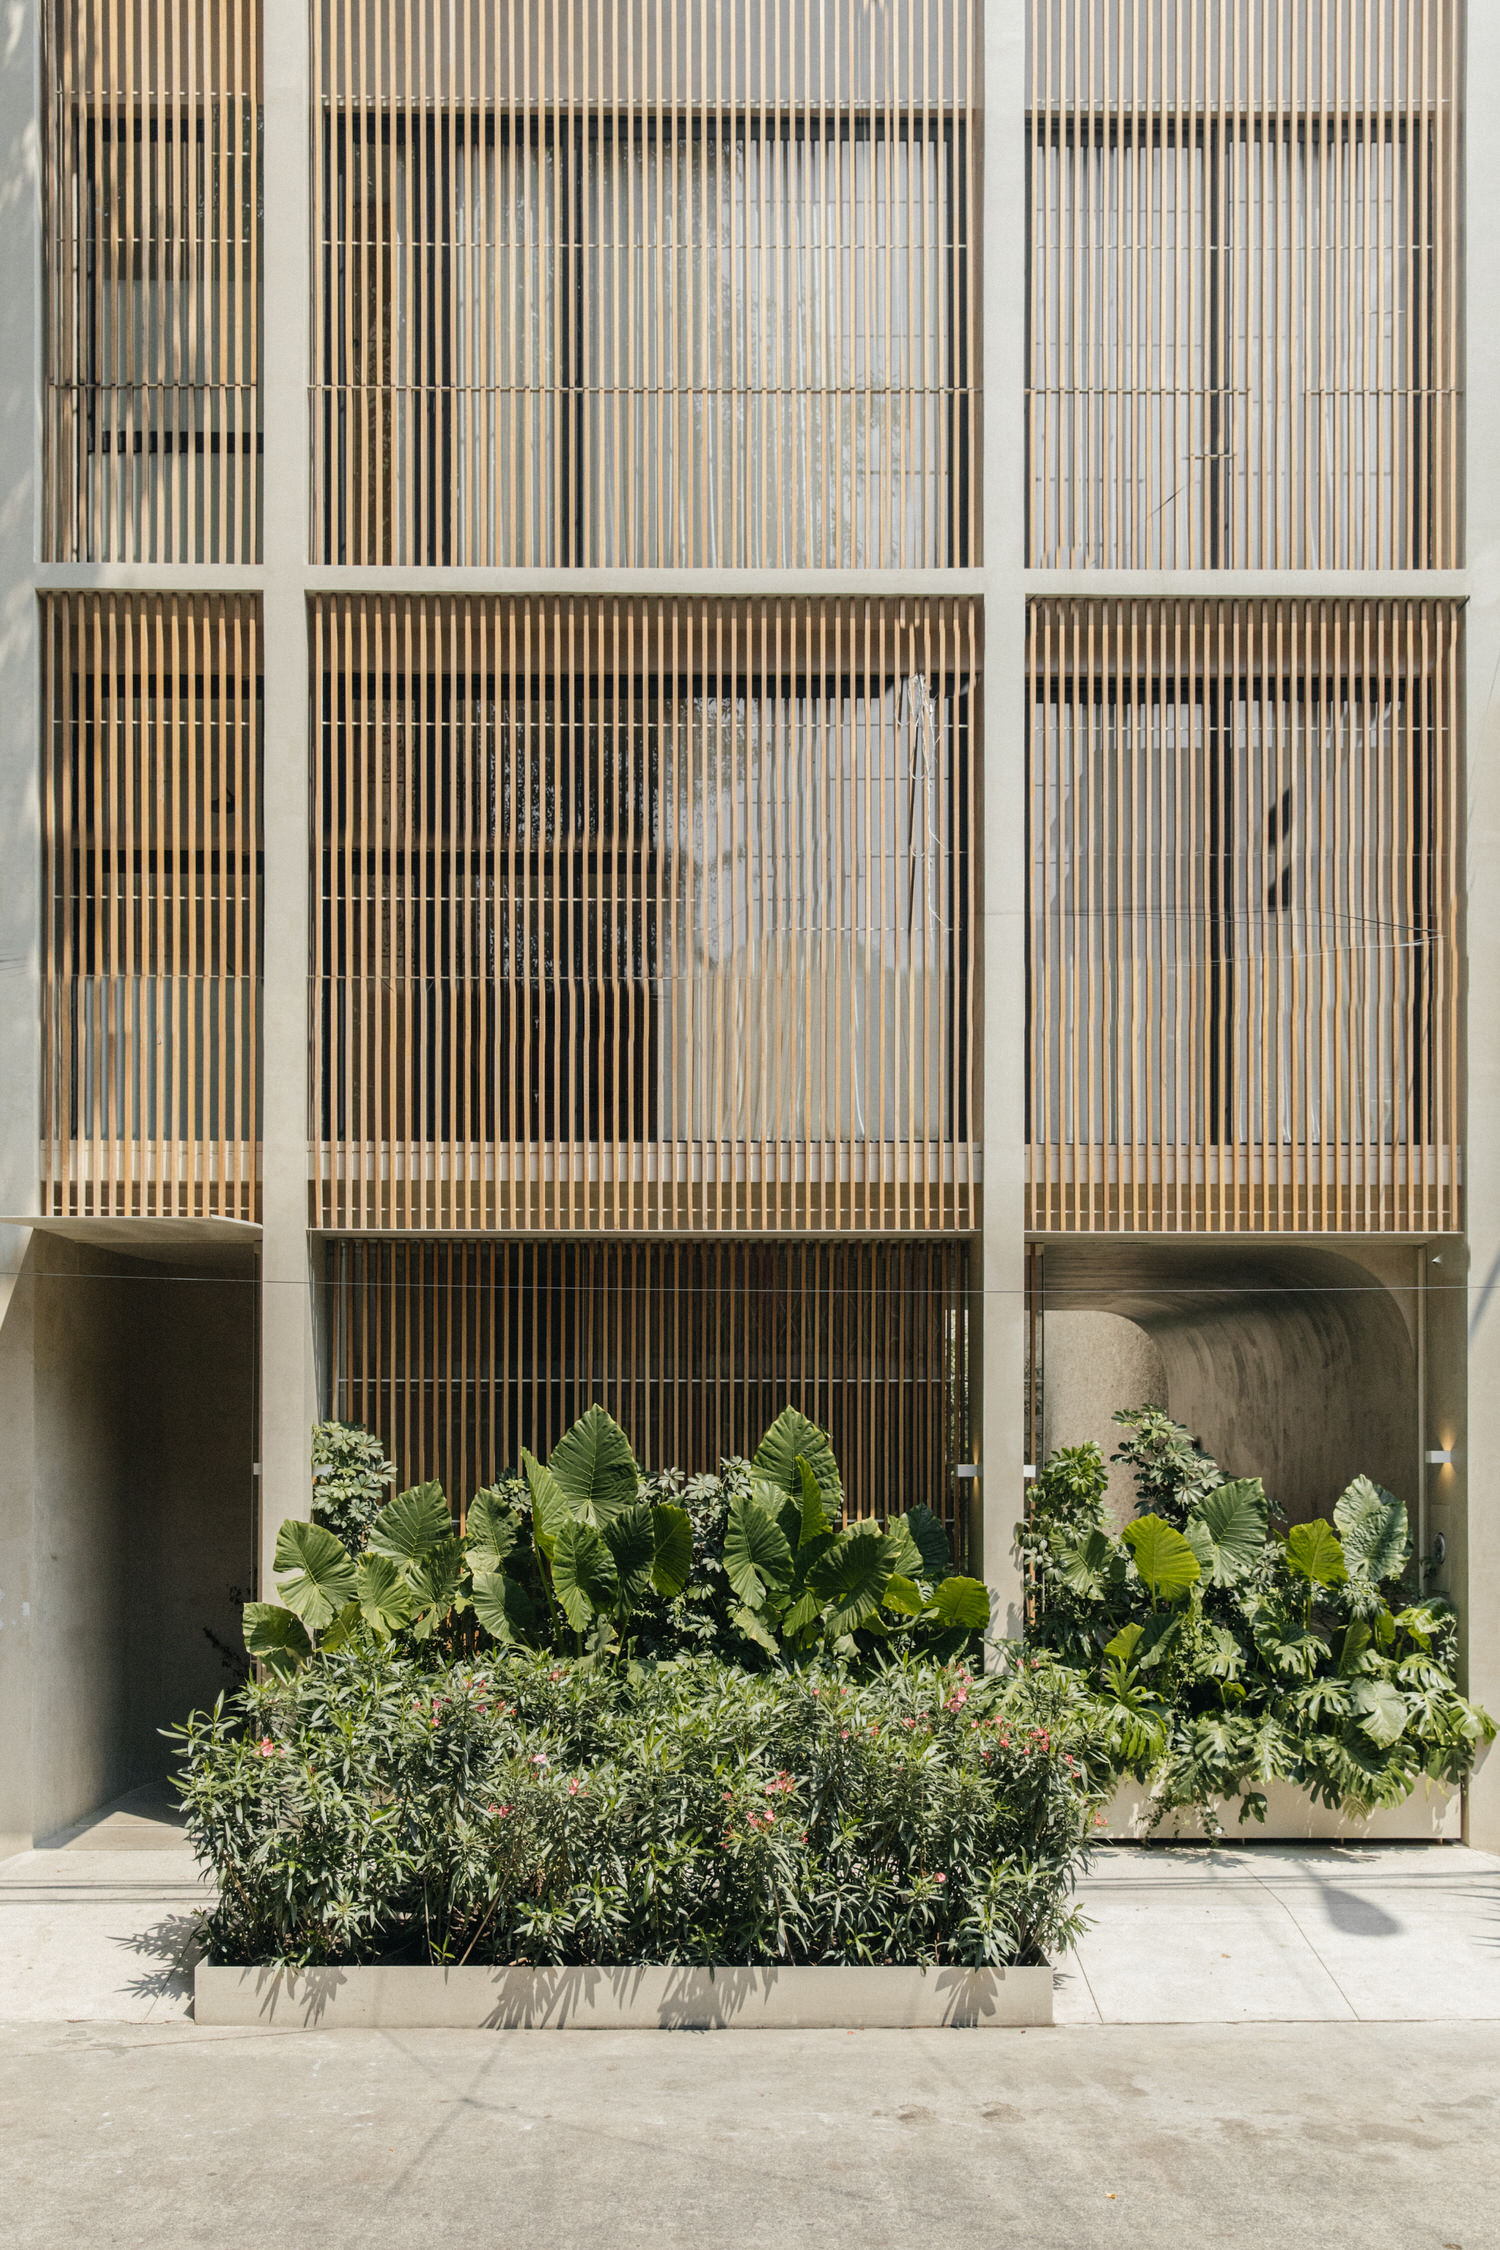 PPAA, Casa Octavia Boutique Hotel Condesa, Mexico Architecture, Maureen Evans | Yellowtrace